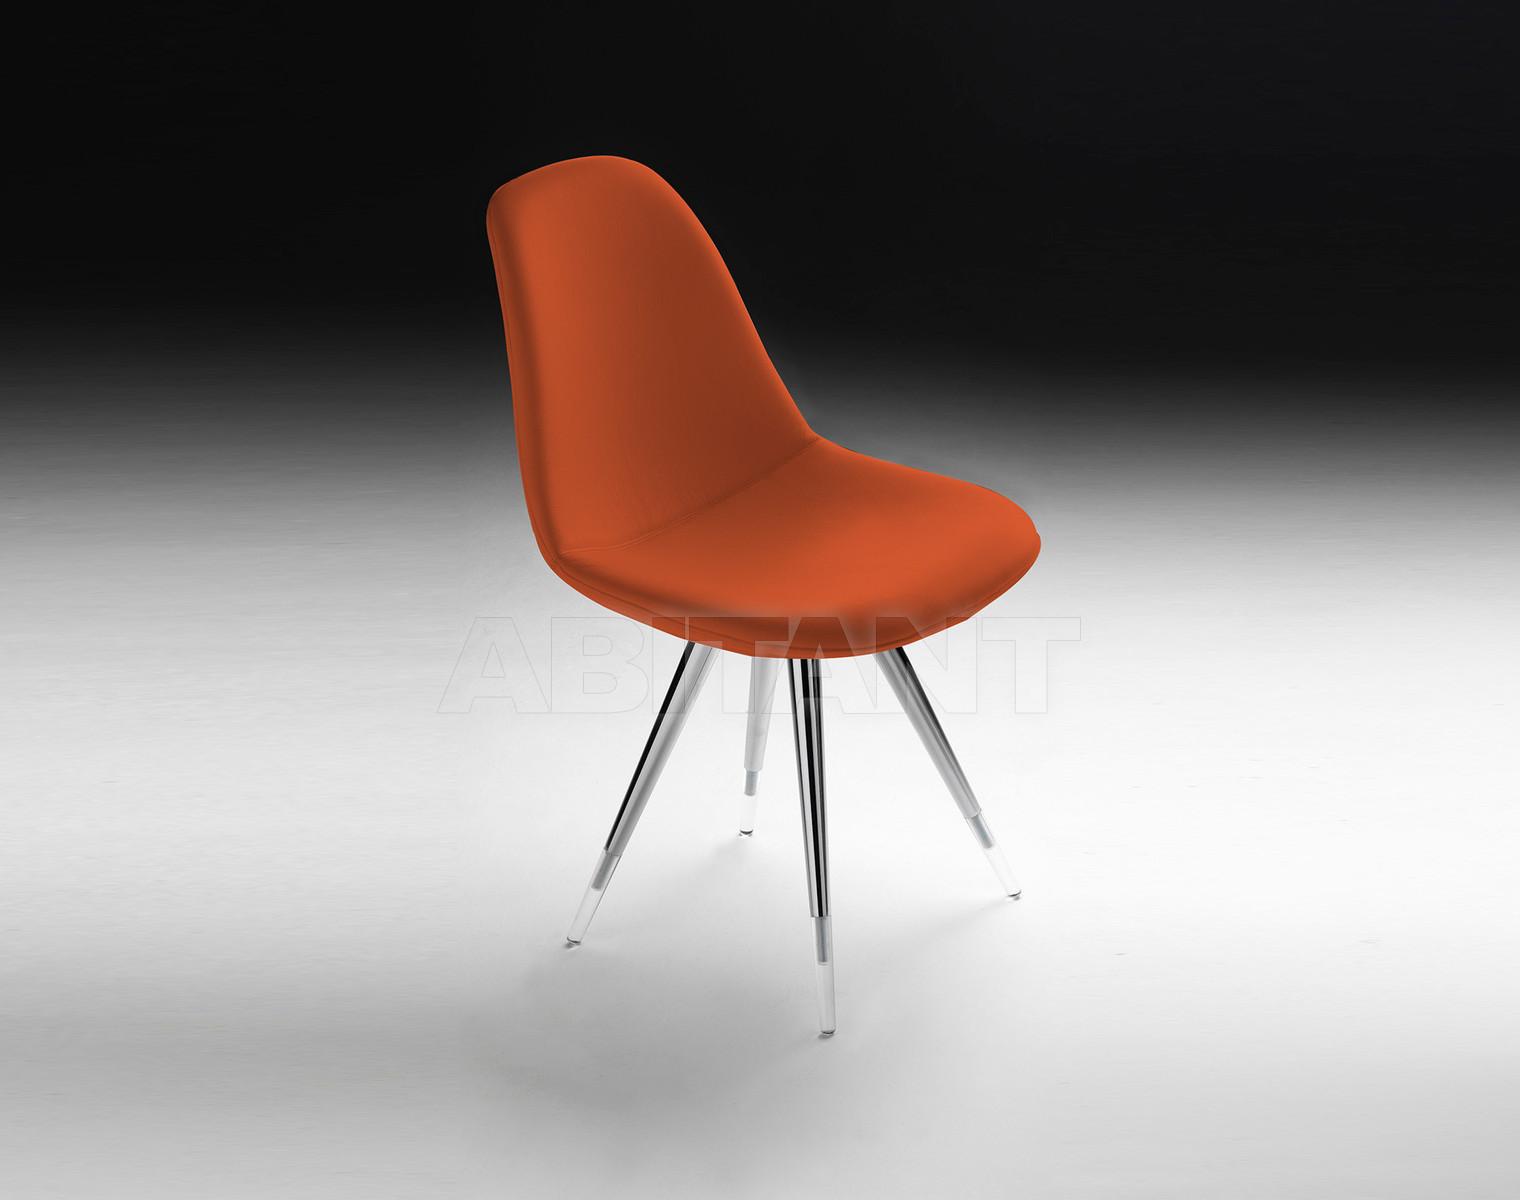 Купить Стул Kubikoff Gino Lemson & Ruud Bos Angel'POP'Chair' 10